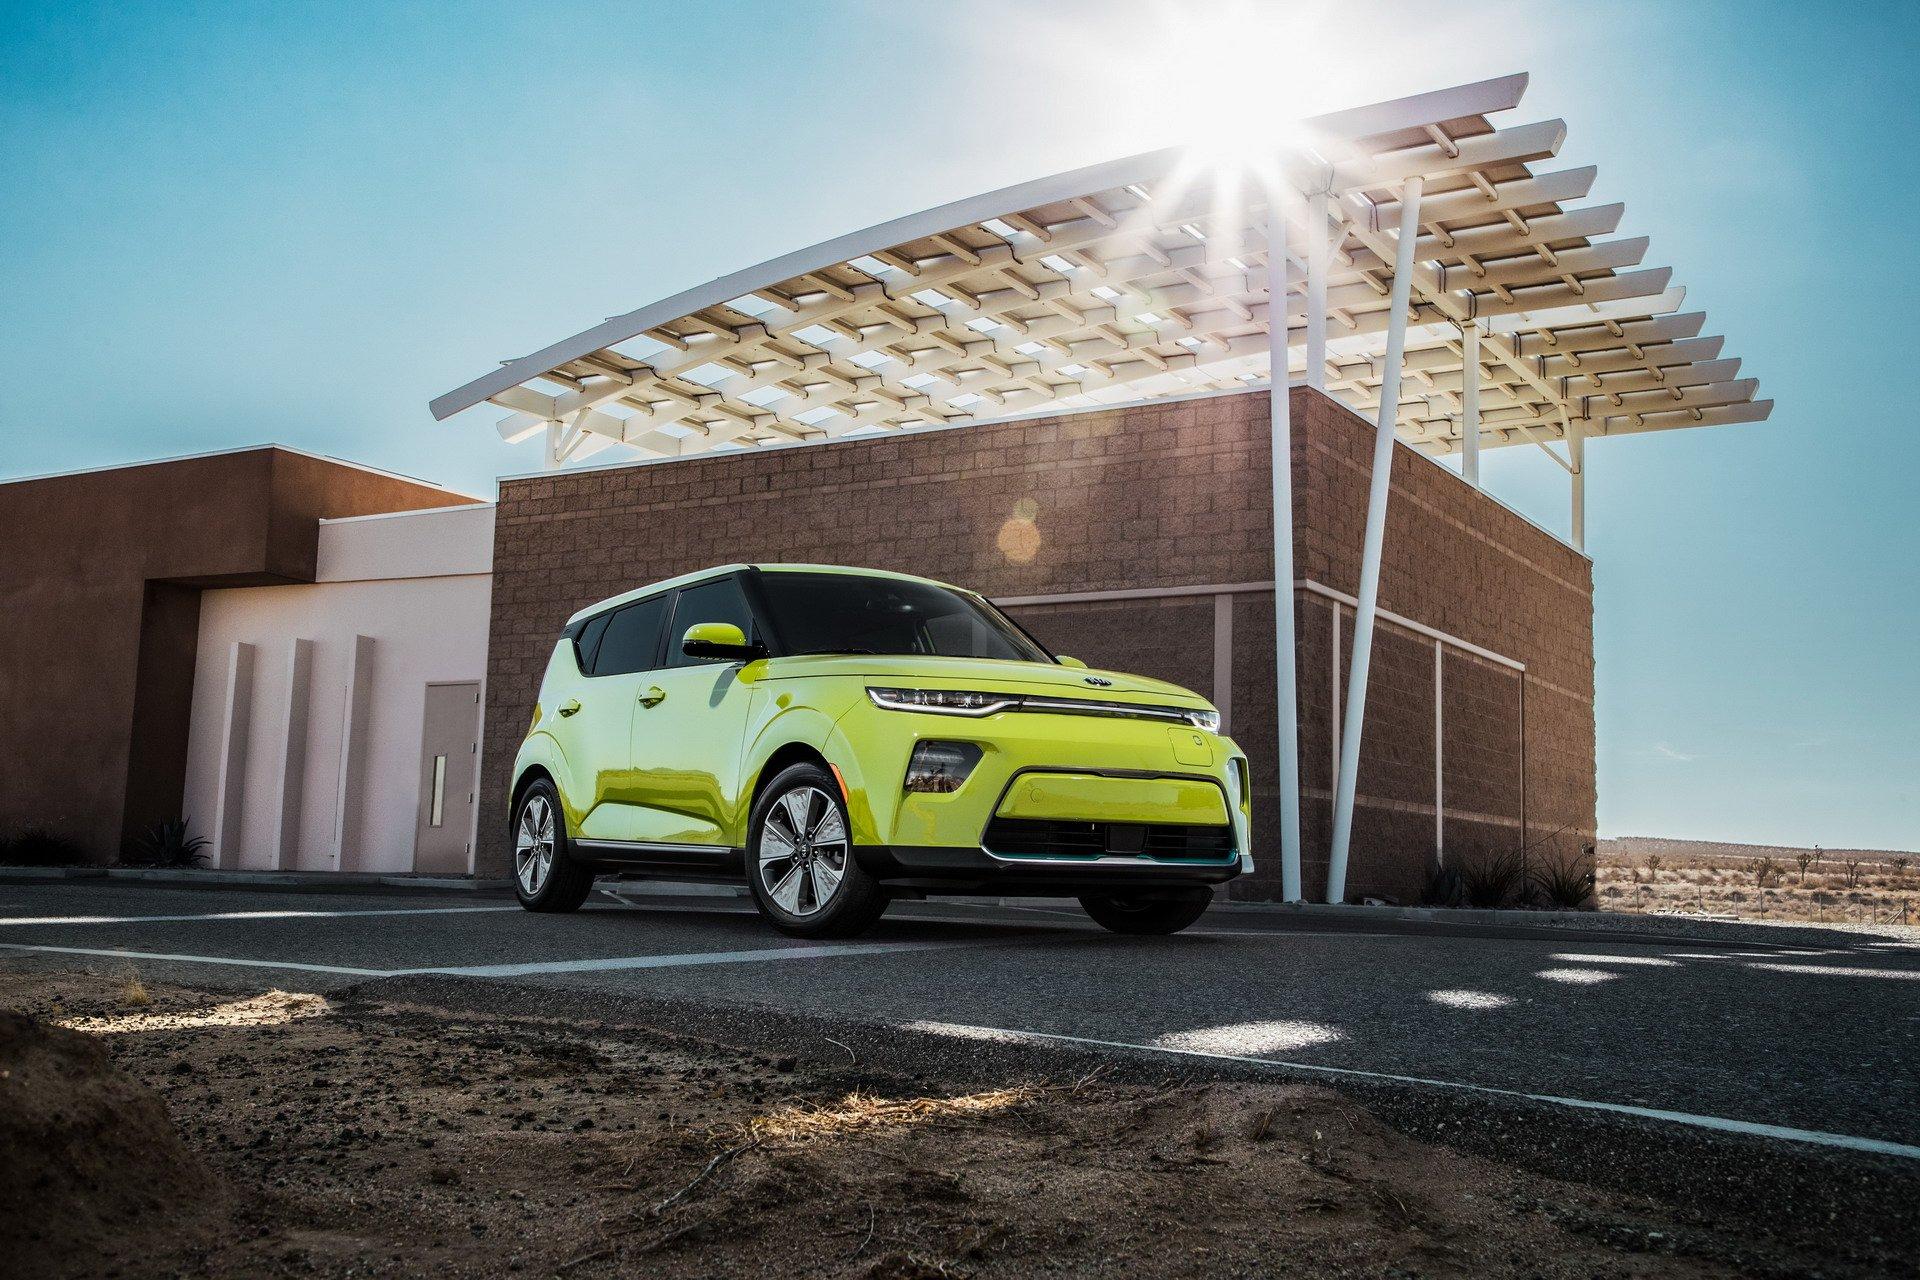 2020 Kia Soul EV Shocks LA With 64 kWh Battery and Acid Paint